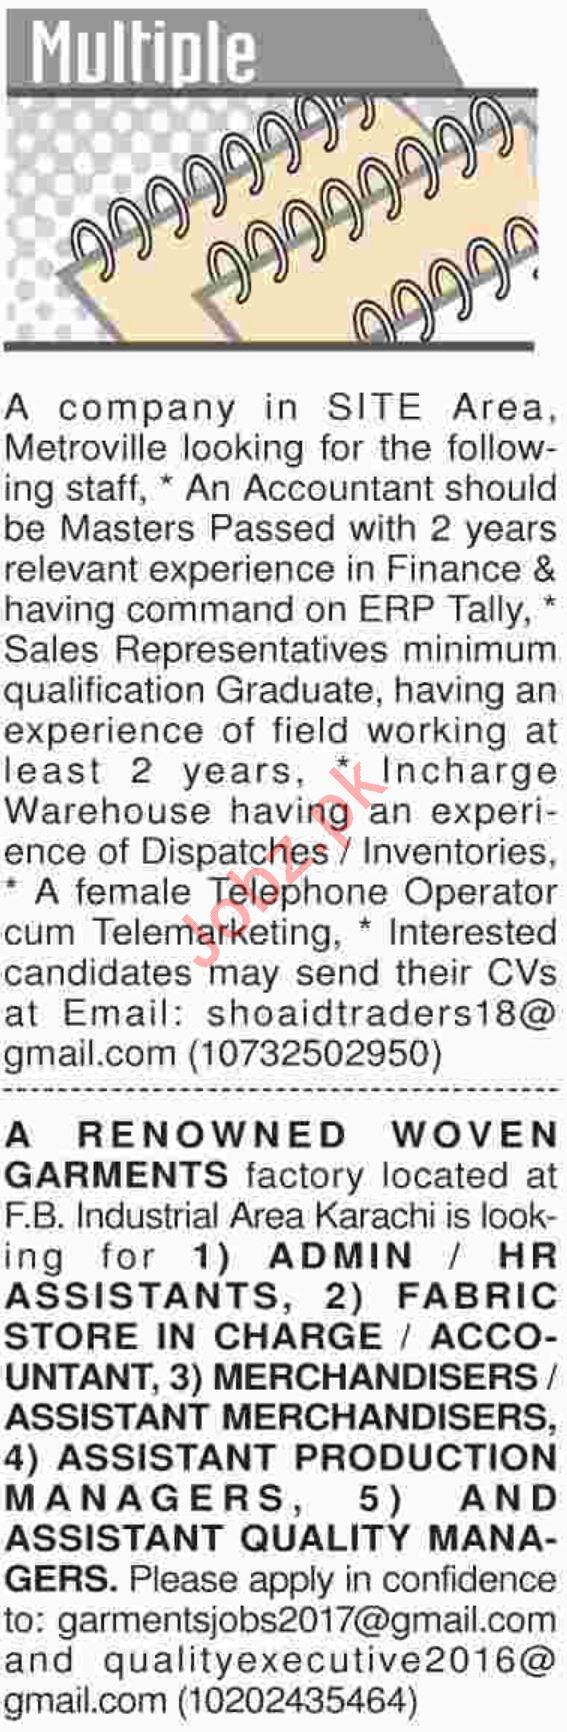 Dawn Newspaper Sunday Multiple Classified Ads 9/12/2018